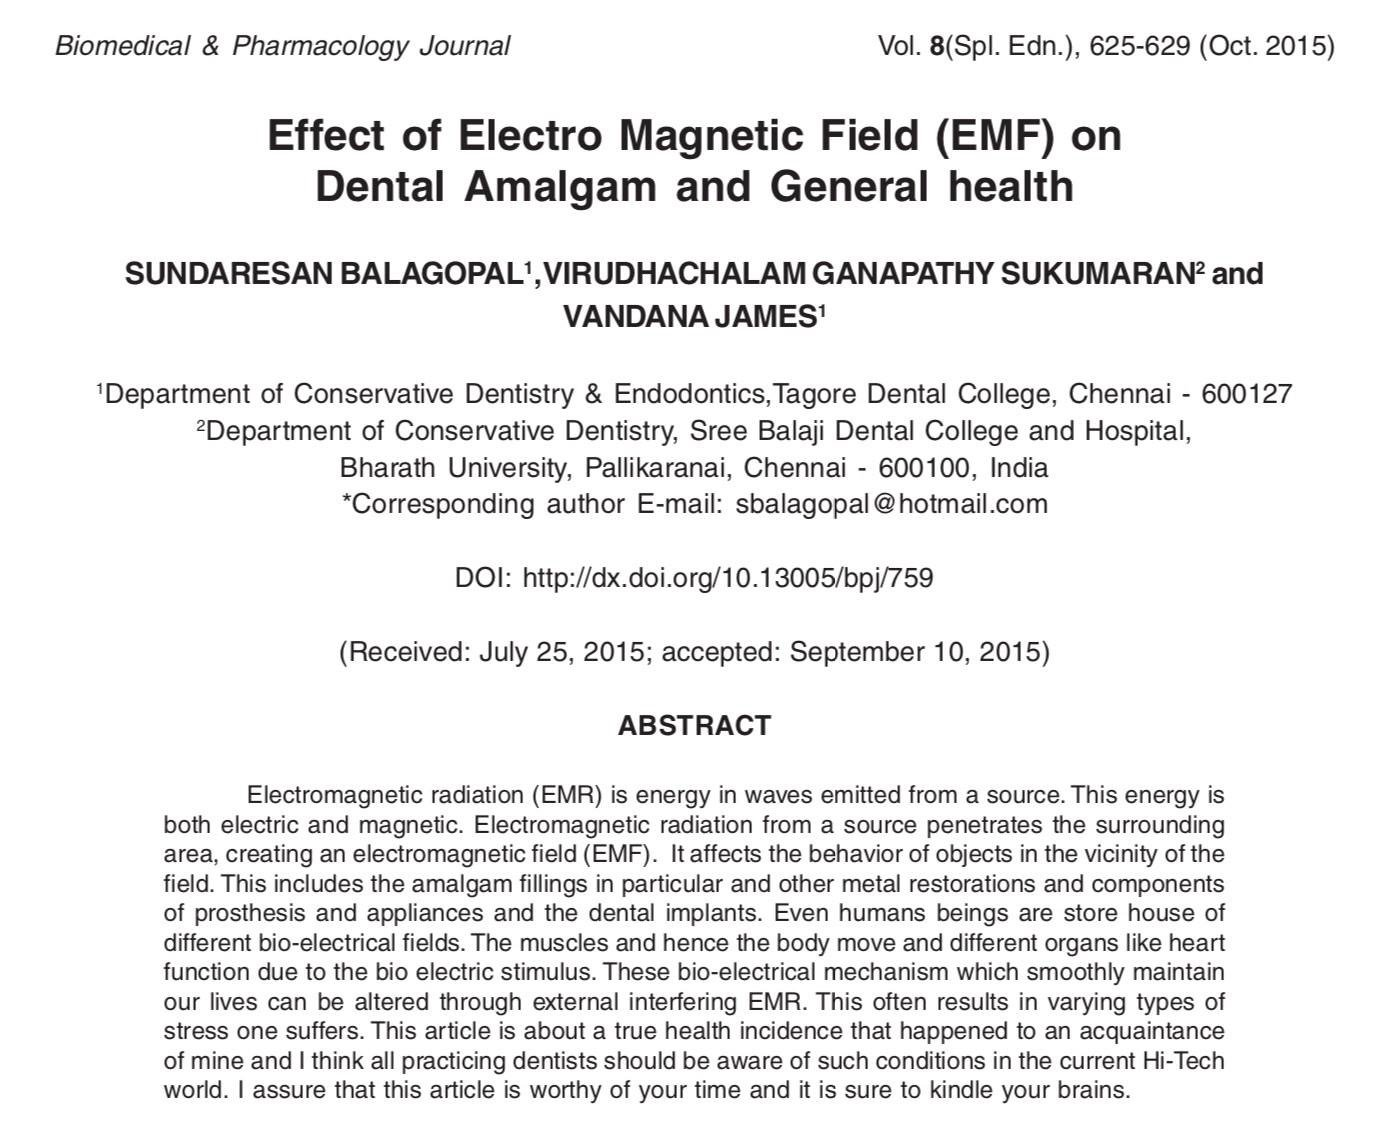 EMF headaches dental mercury fillings amalgam dental fillings PEMF EMF sensitivity